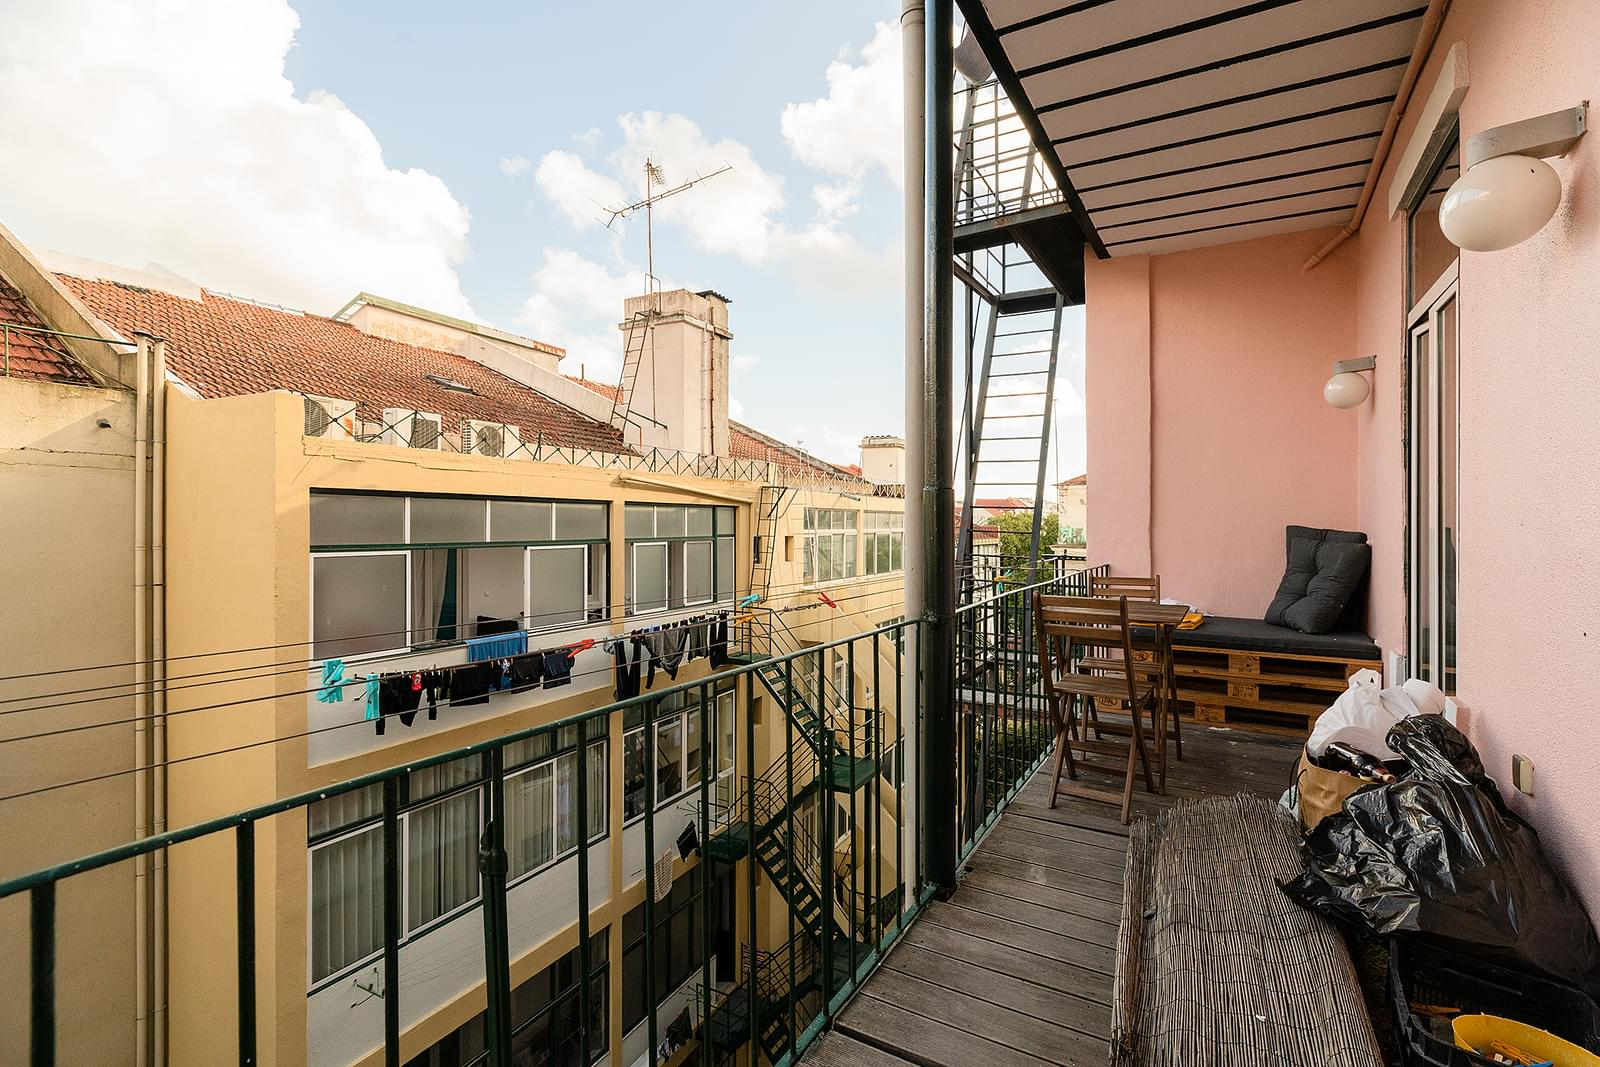 pf18211-apartamento-t2-1-lisboa-8819db23-bada-4313-b415-41974a317557